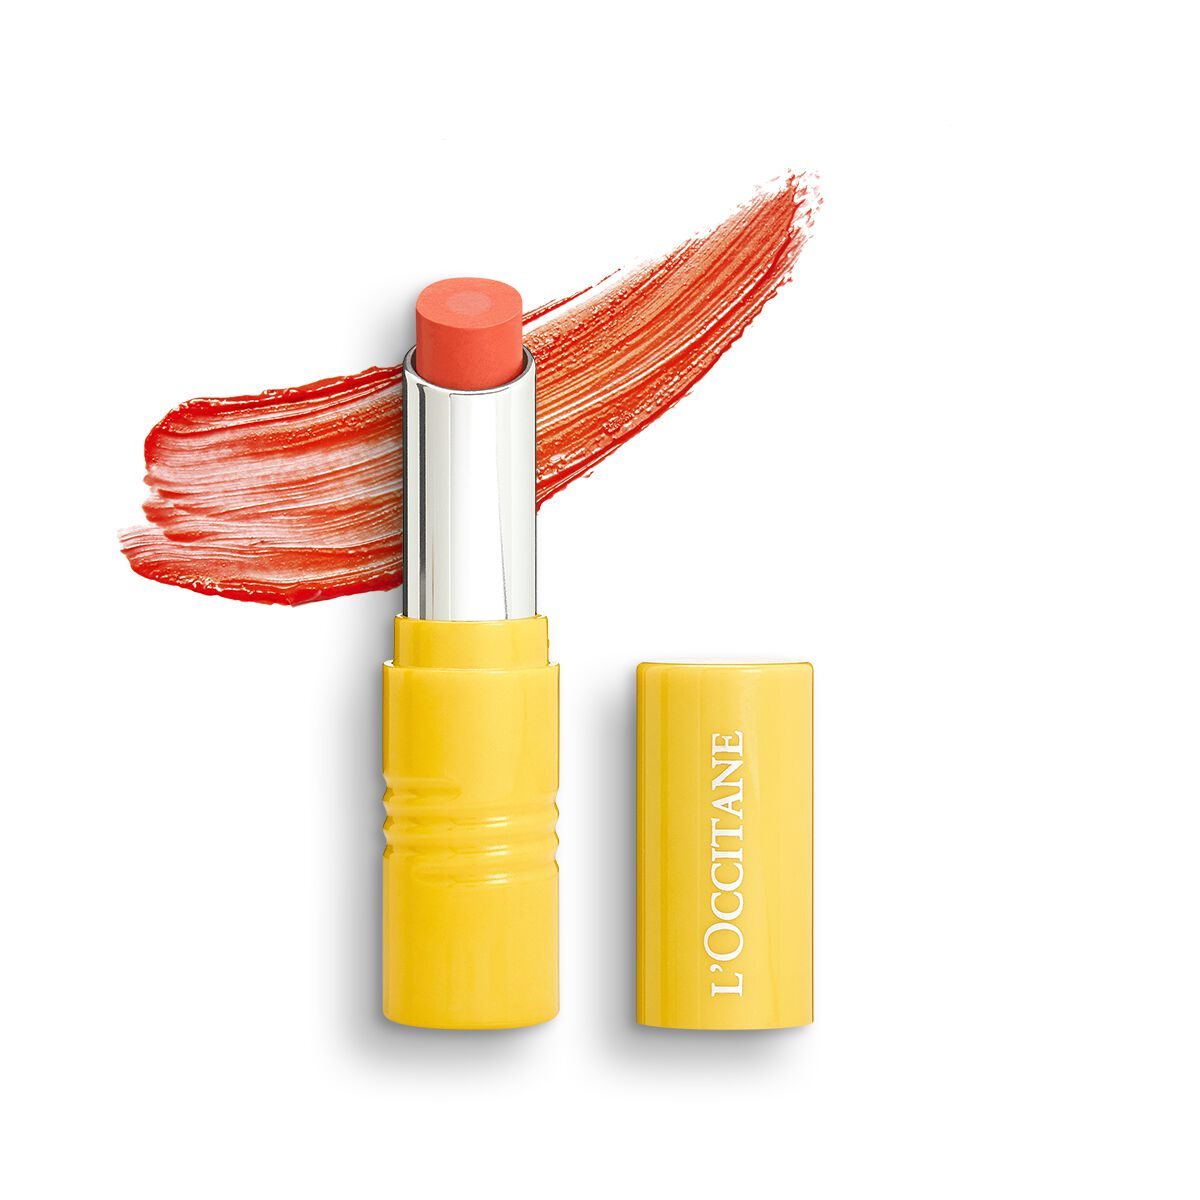 Fruity Lipstick - 040 Gor-juice Pomelo 0.09 oz.